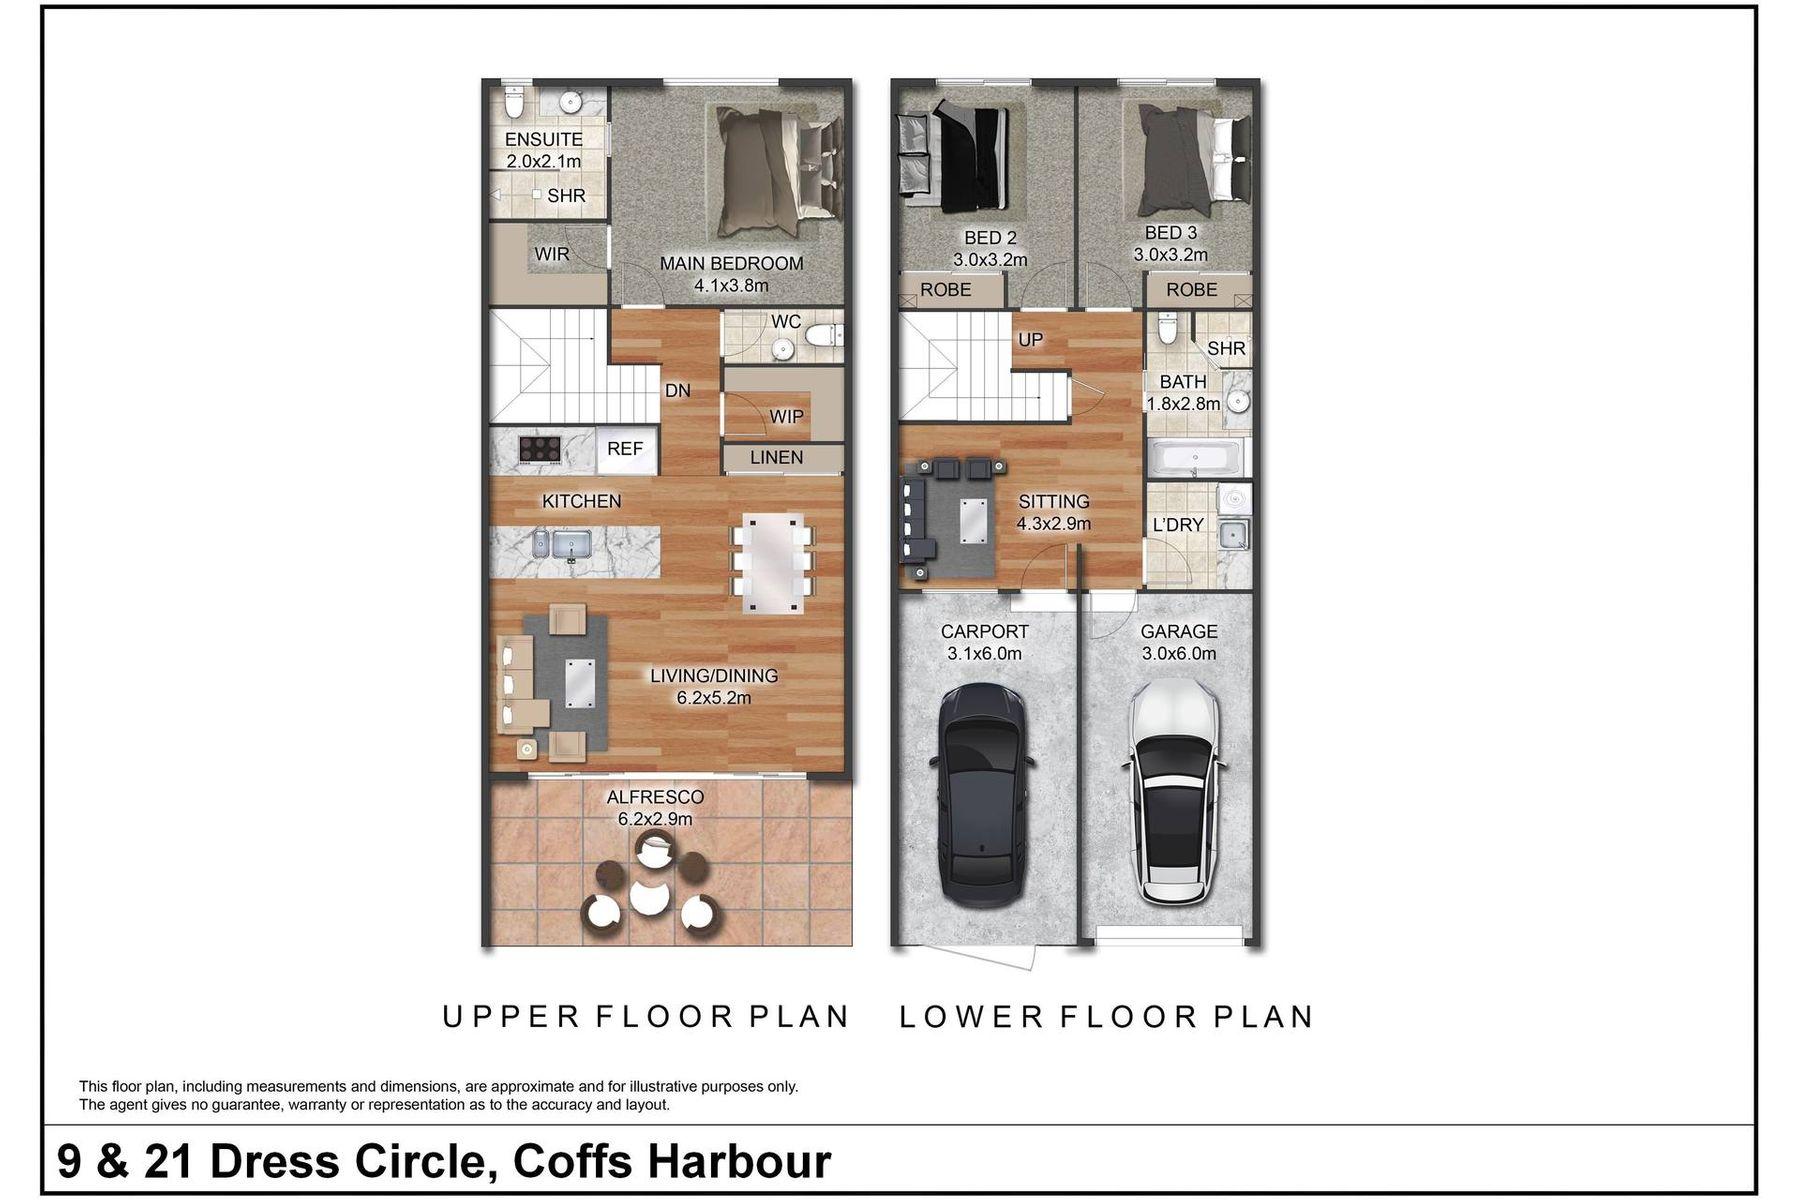 13 Dress Circle, Coffs Harbour, NSW 2450